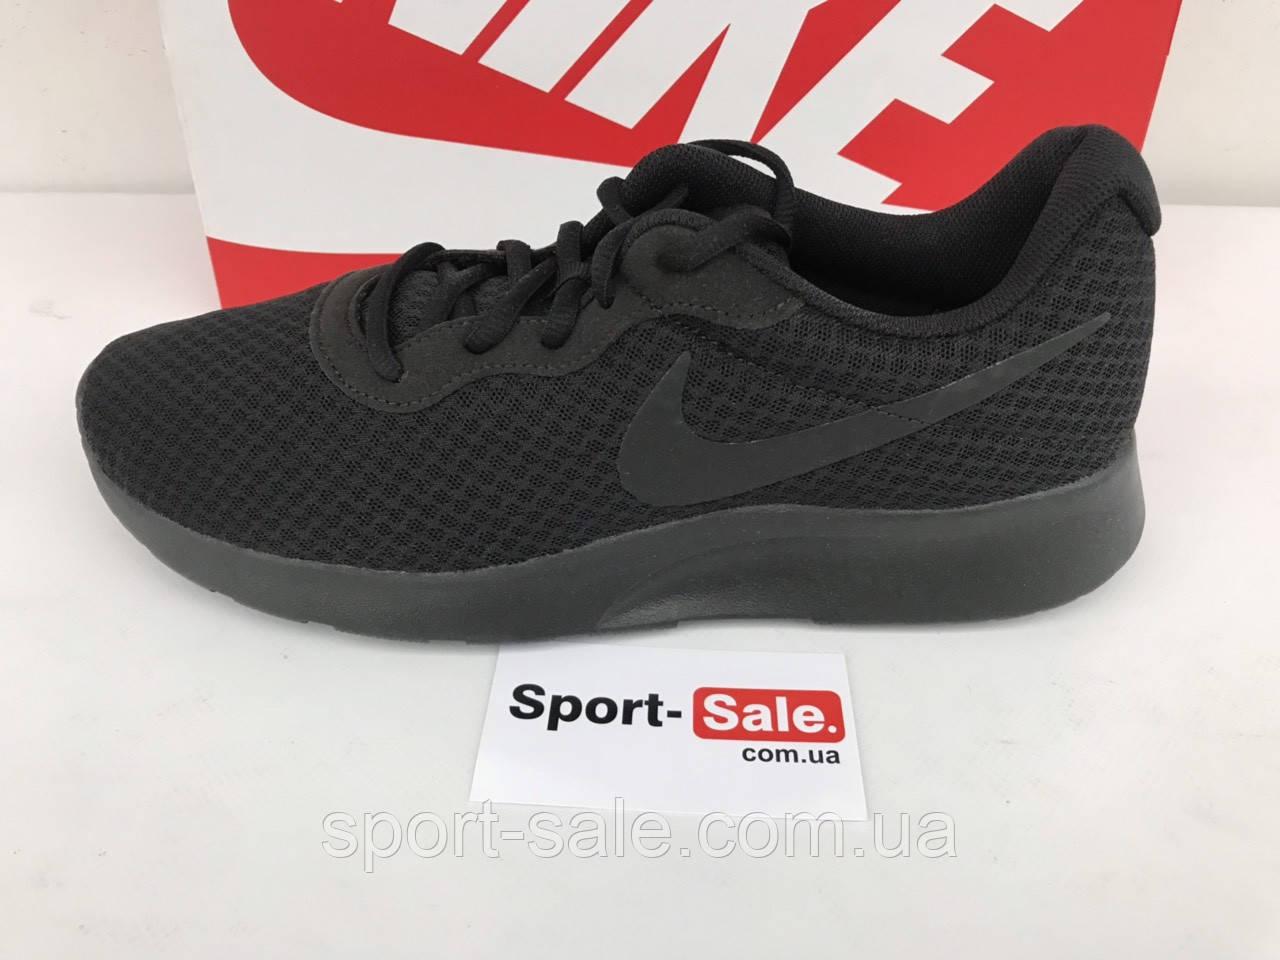 7e2018aa Кроссовки Nike Tanjun (812654-001), цена 1 750 грн., купить в ...